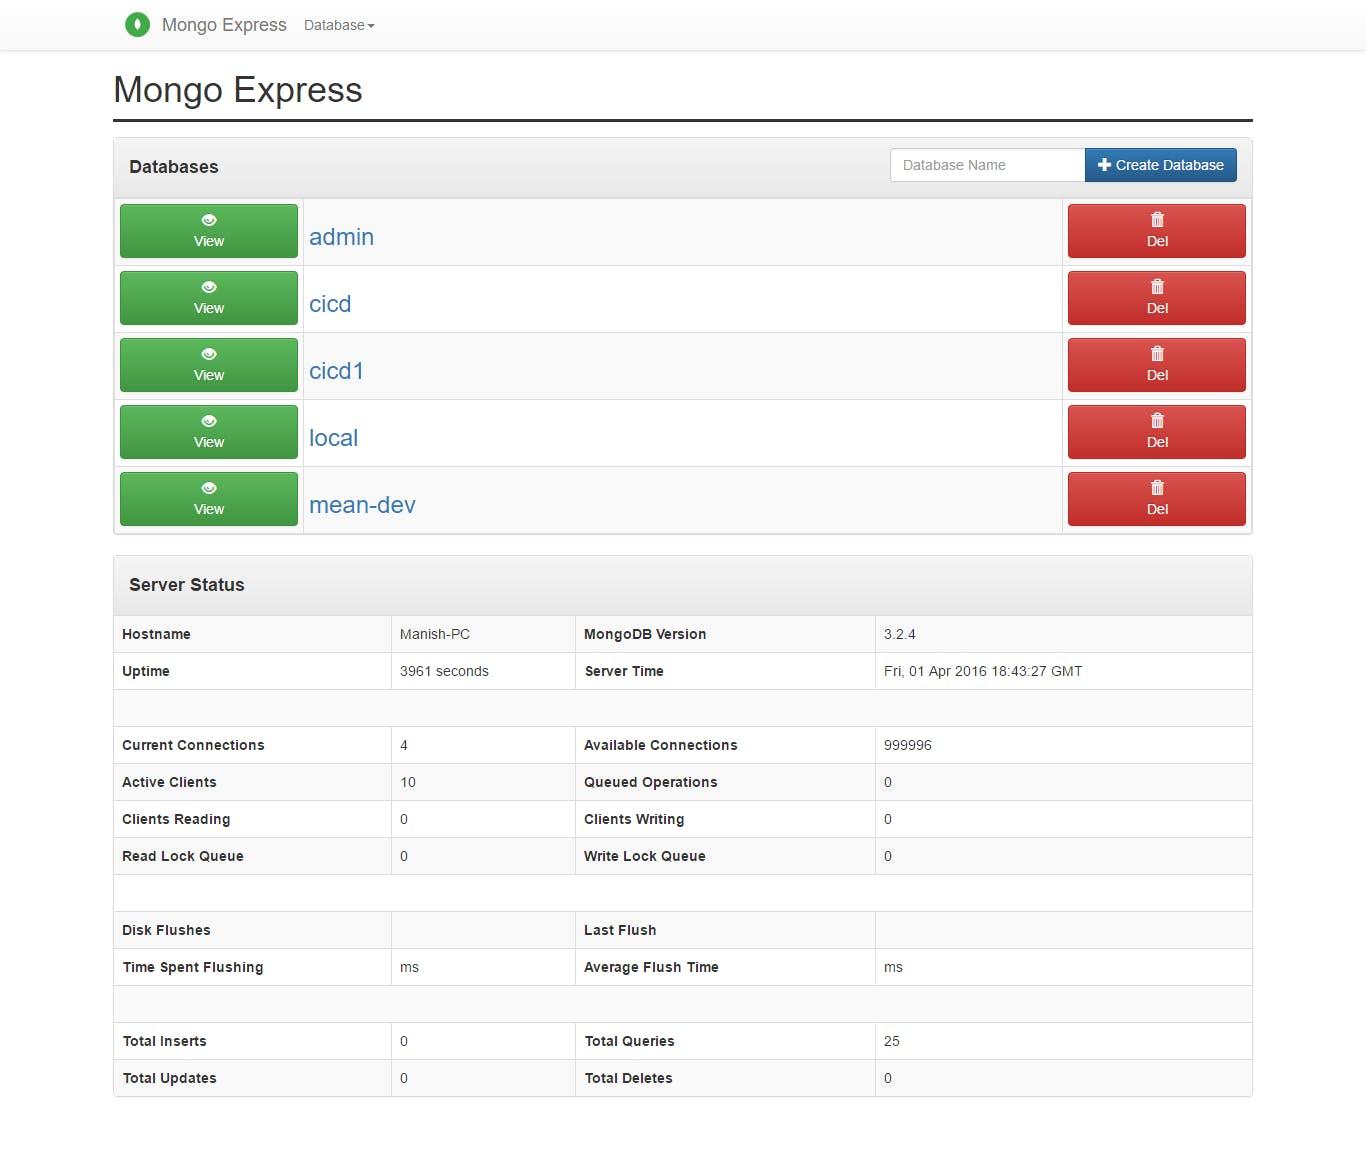 mongo-express